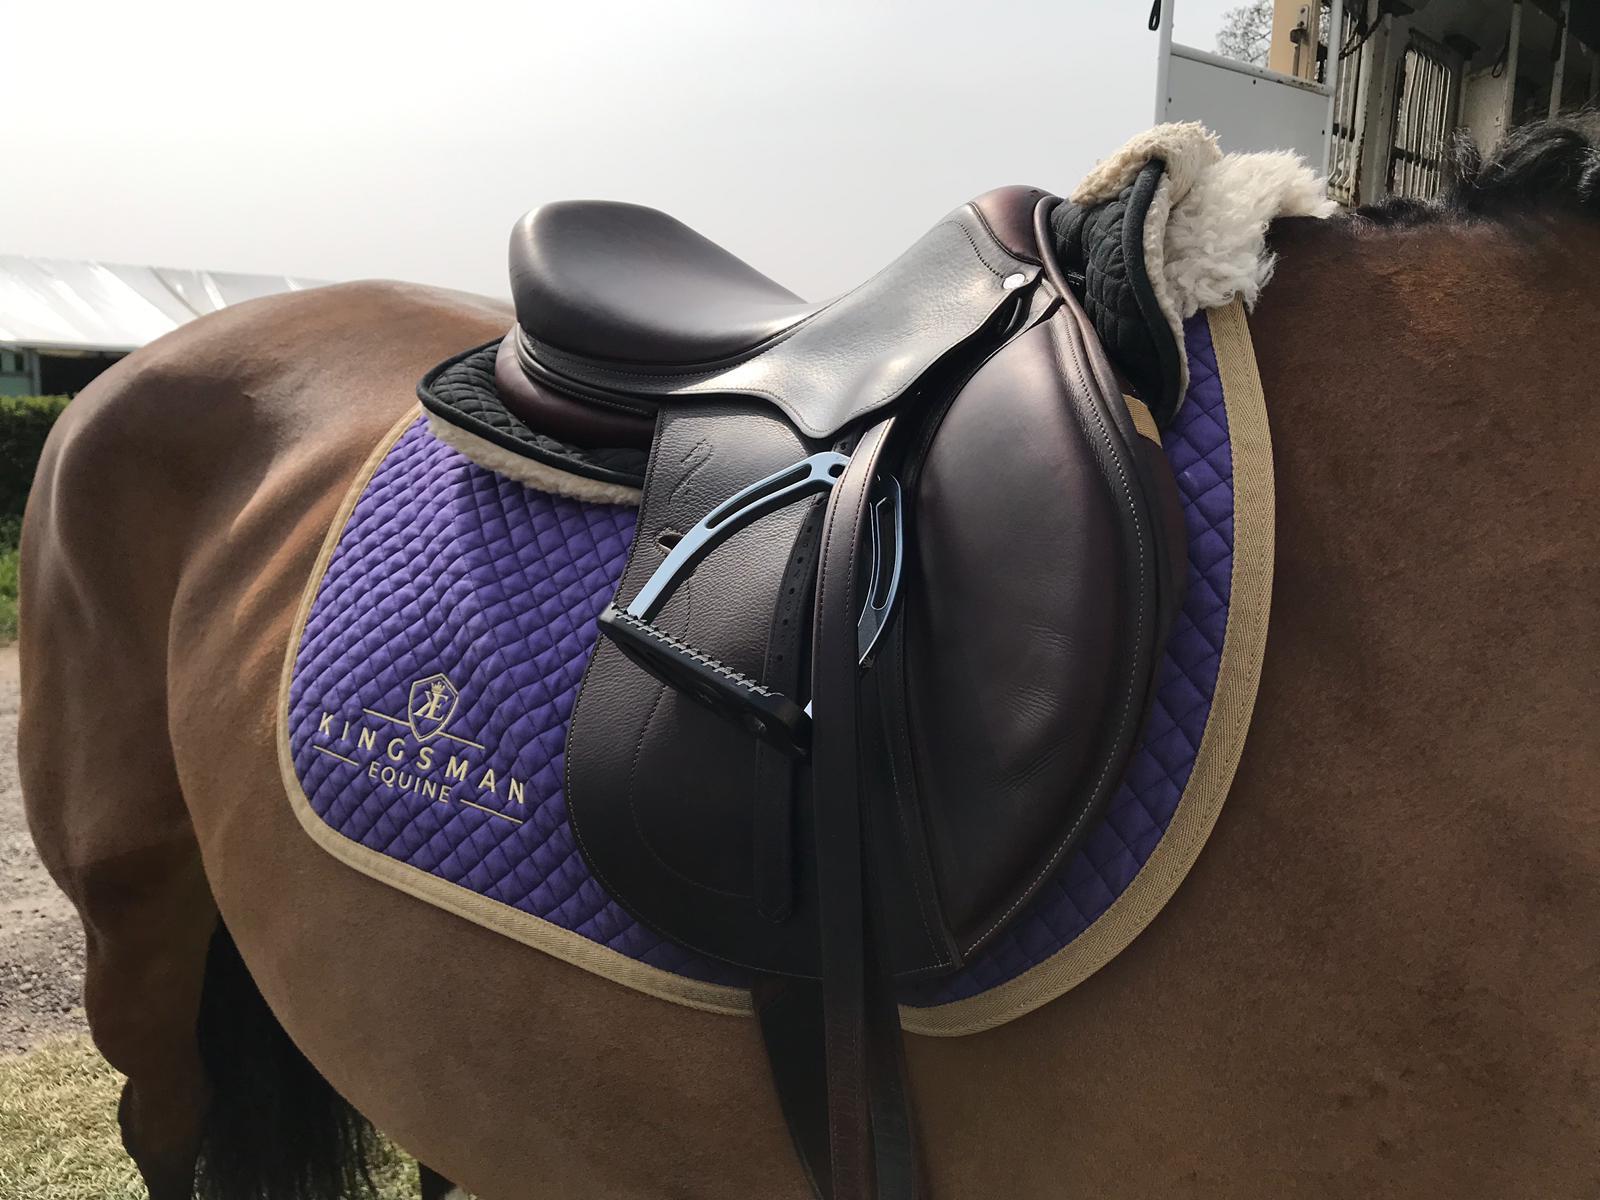 kingsman-equestrian-concierge.jpg